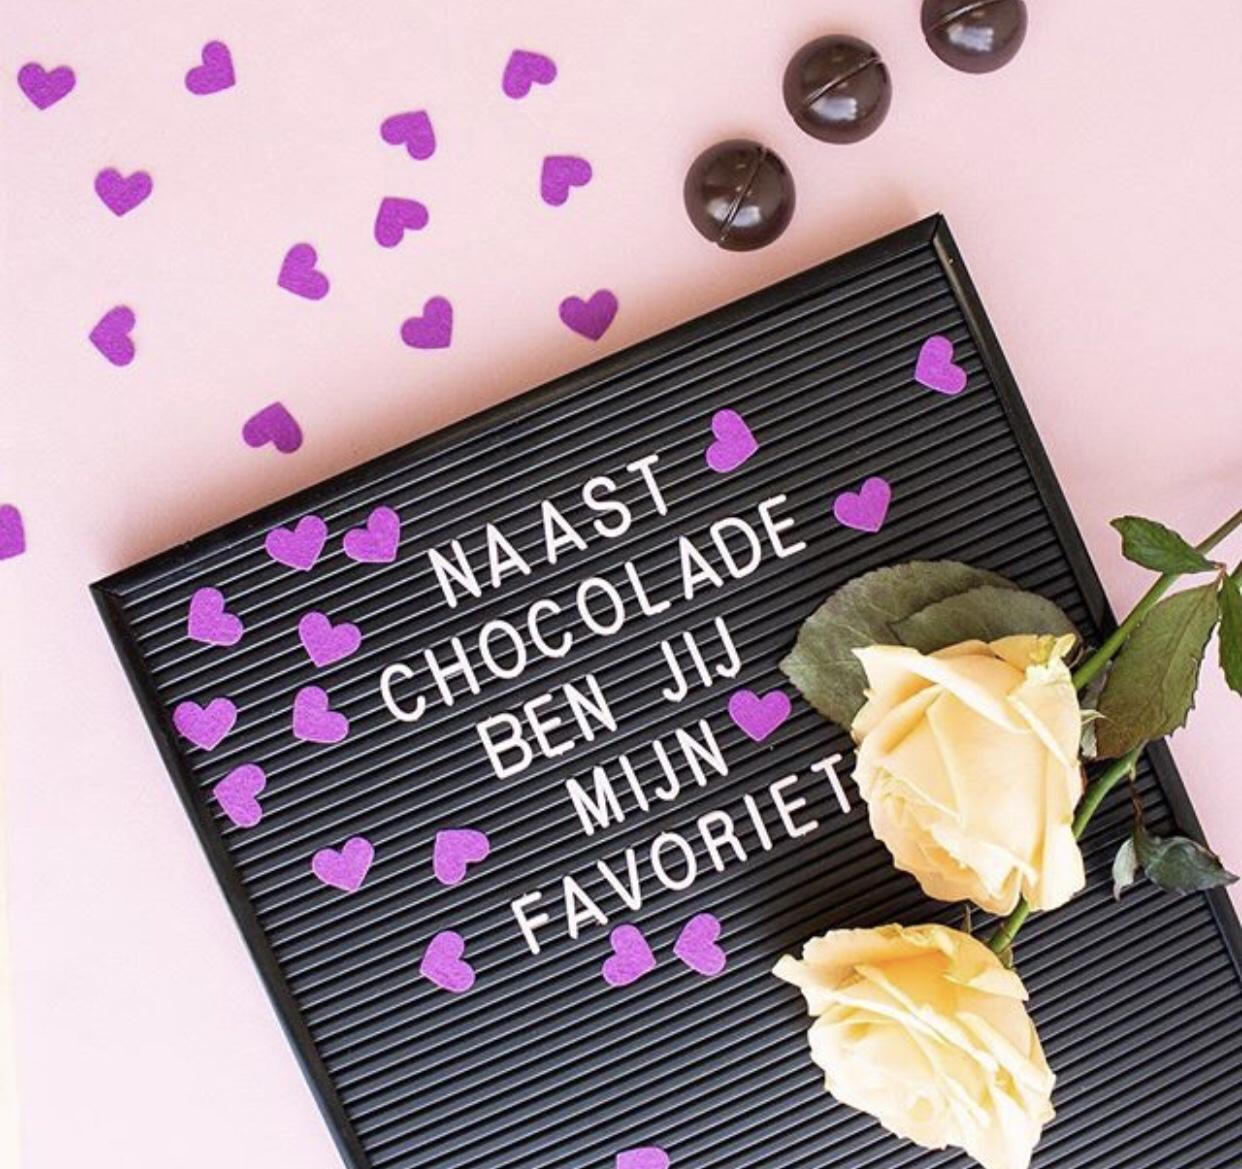 Chocobombes, bonbons, zwanger